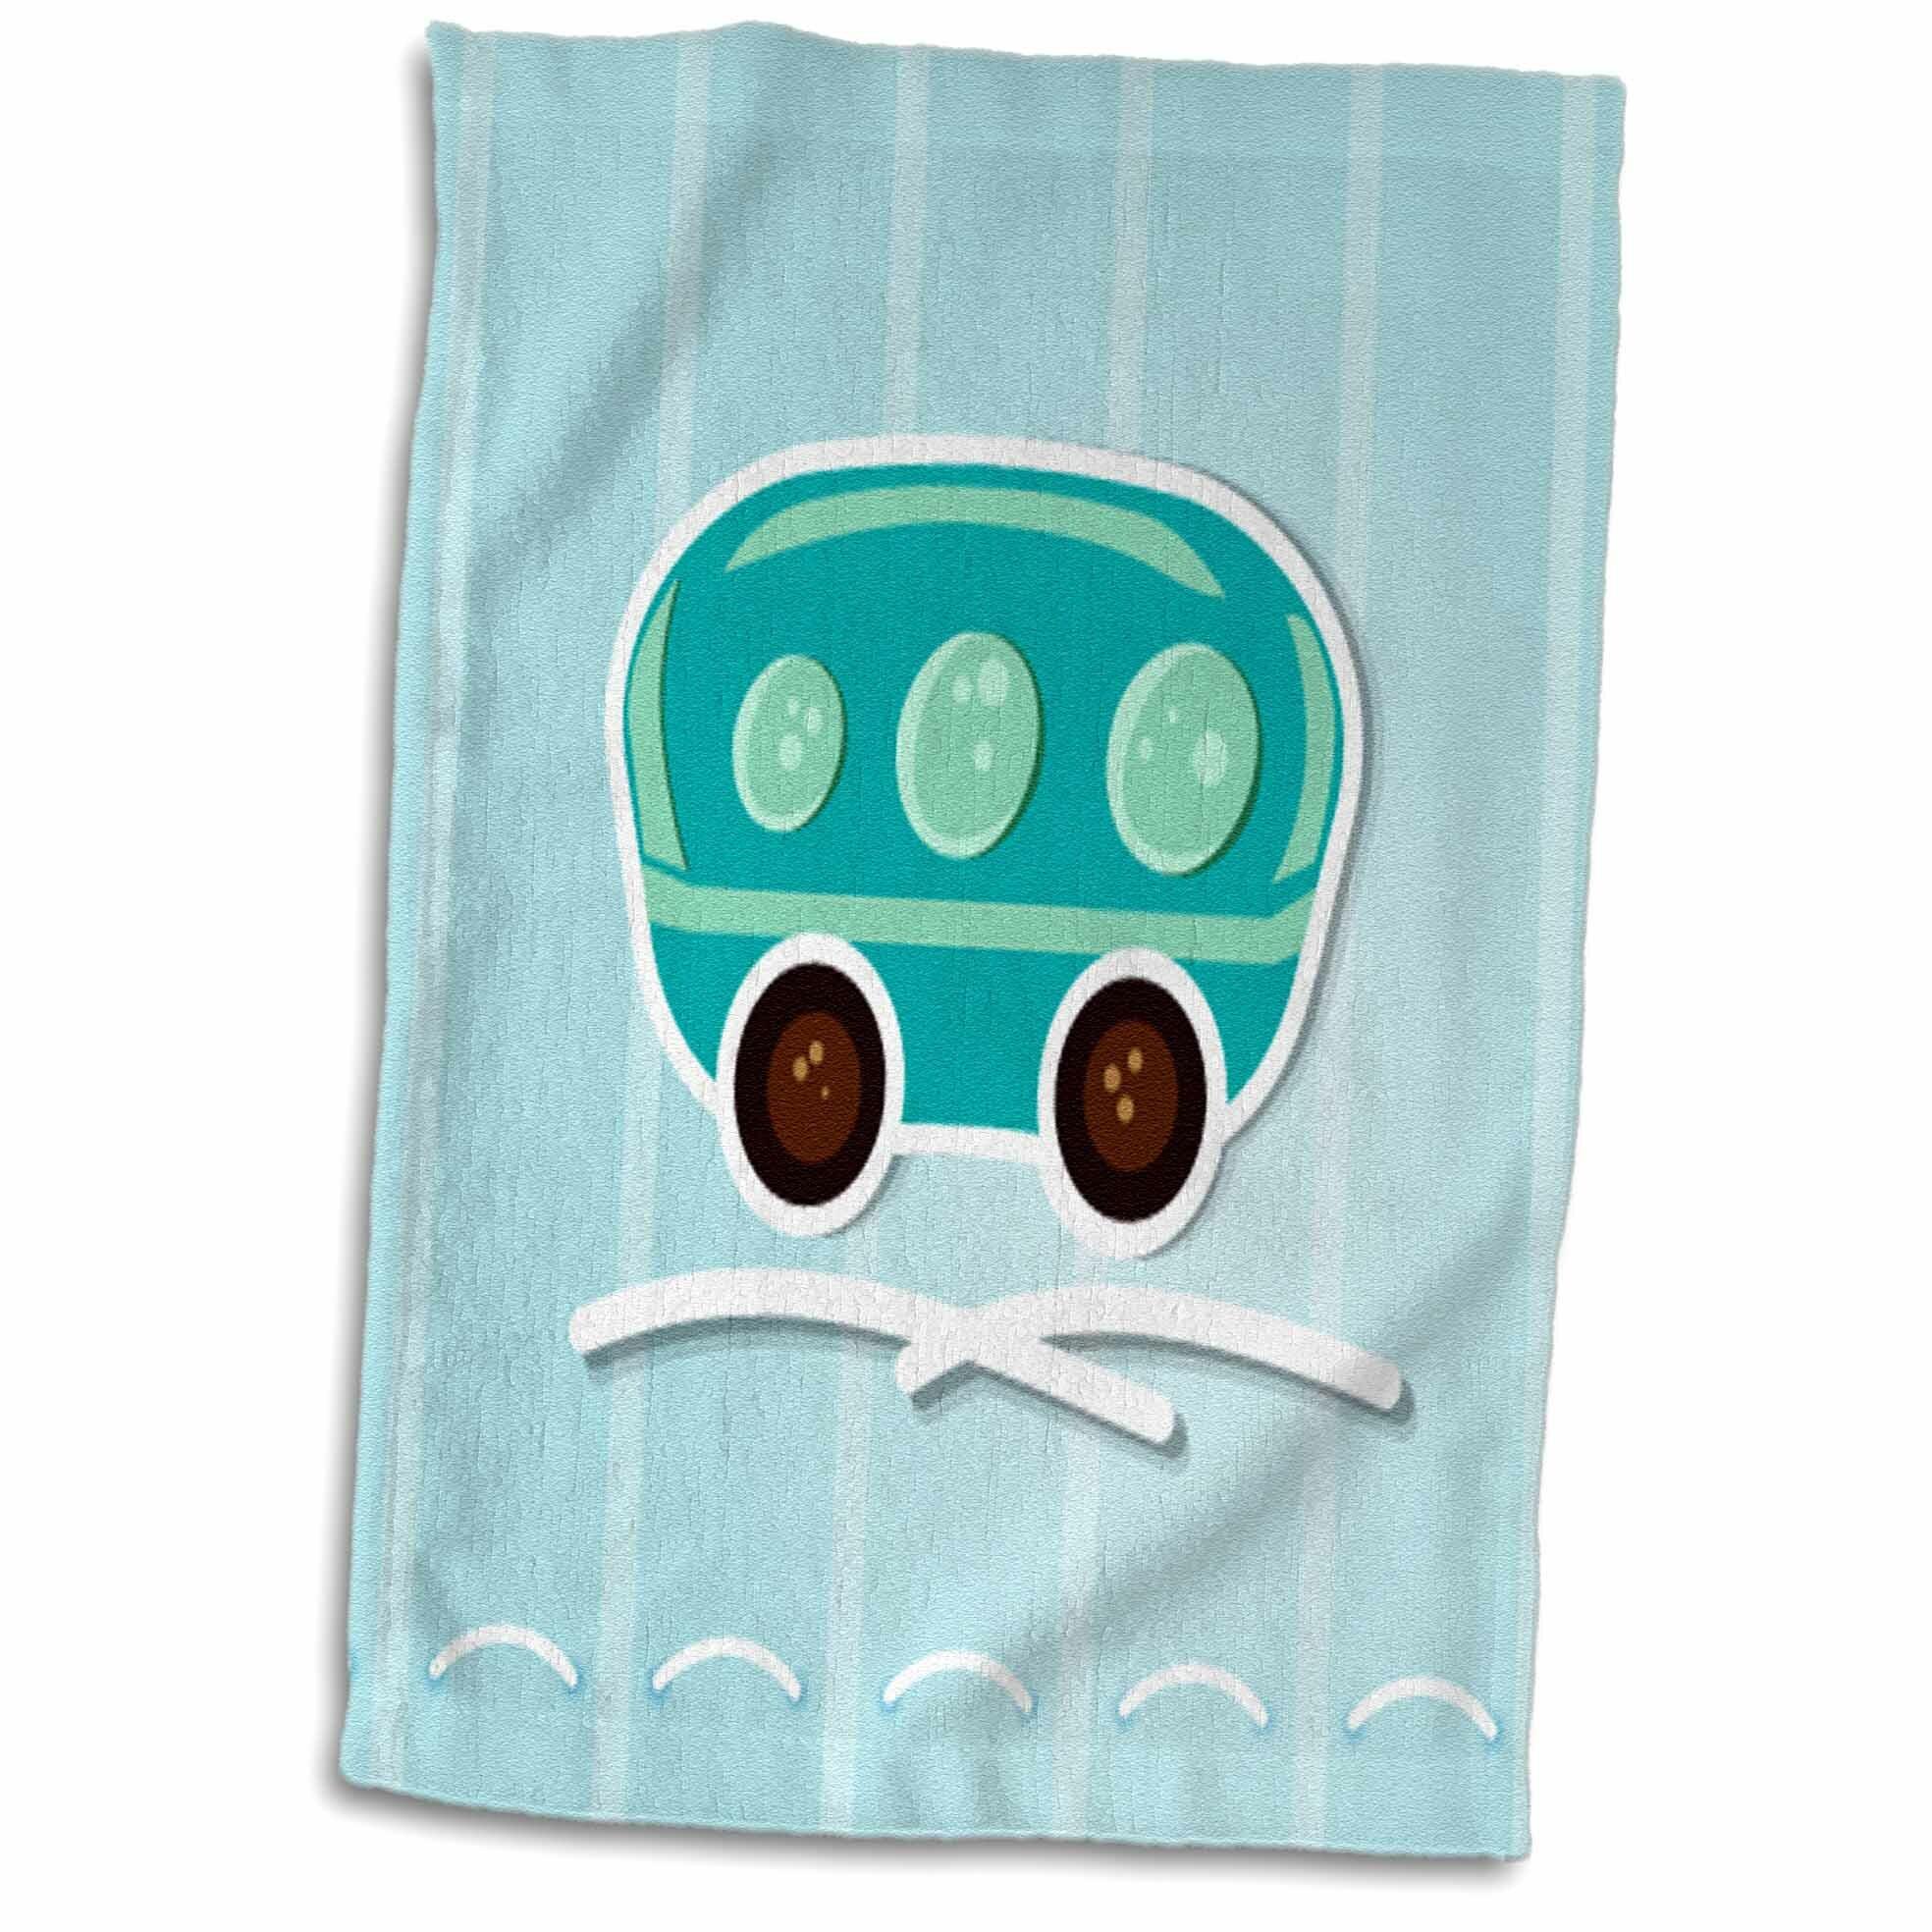 East Urban Home A Cute Camper Illustration Hand Towel Wayfair